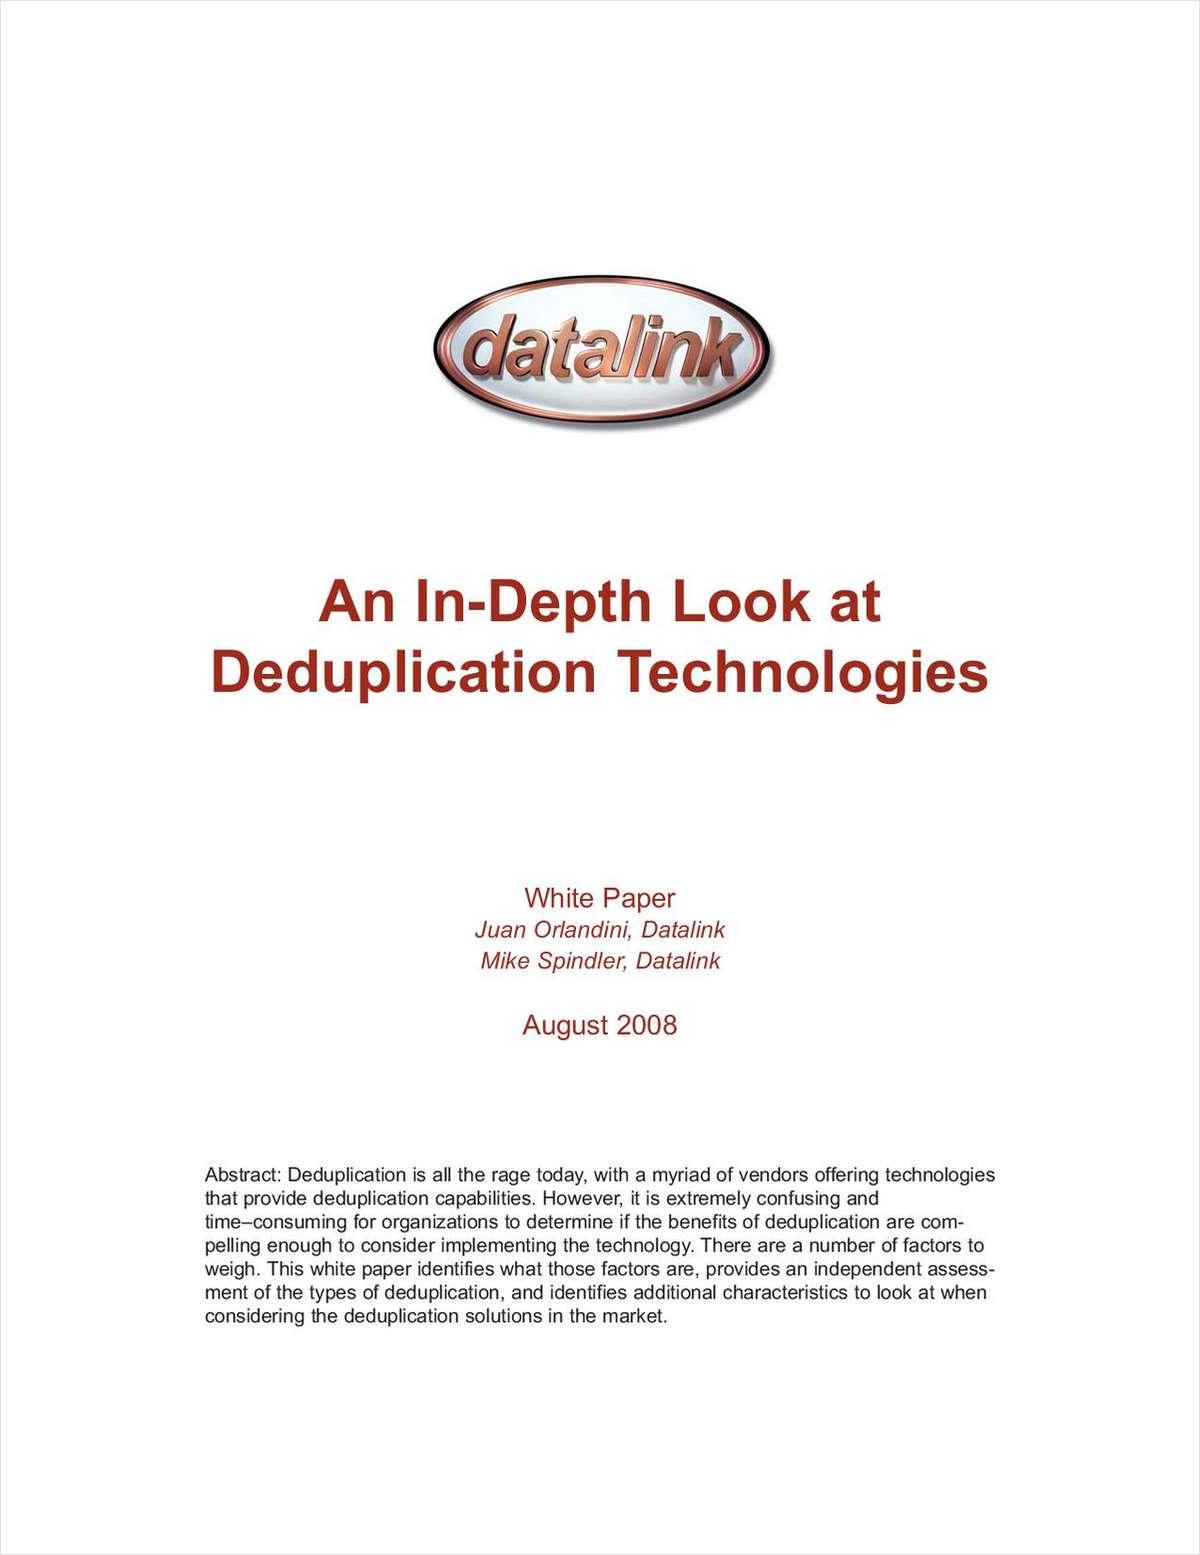 An In-Depth Look at Deduplication Technologies